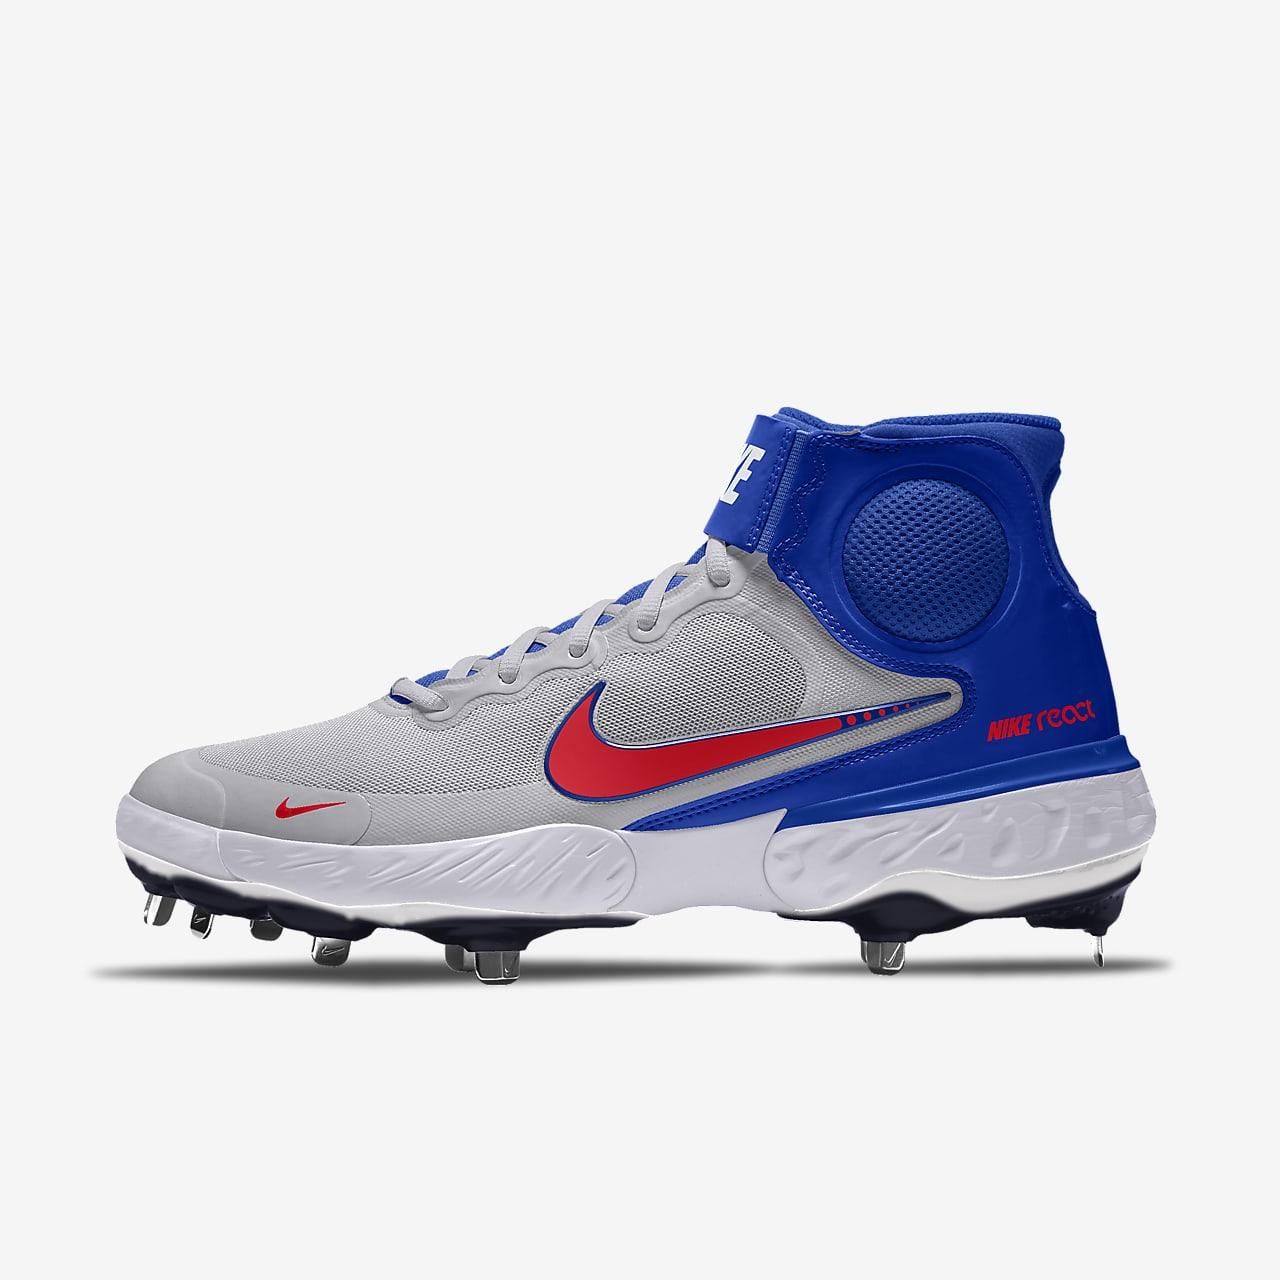 Chaussure de baseball à crampons personnalisable Nike Alpha Huarache Elite 3 Mid By You